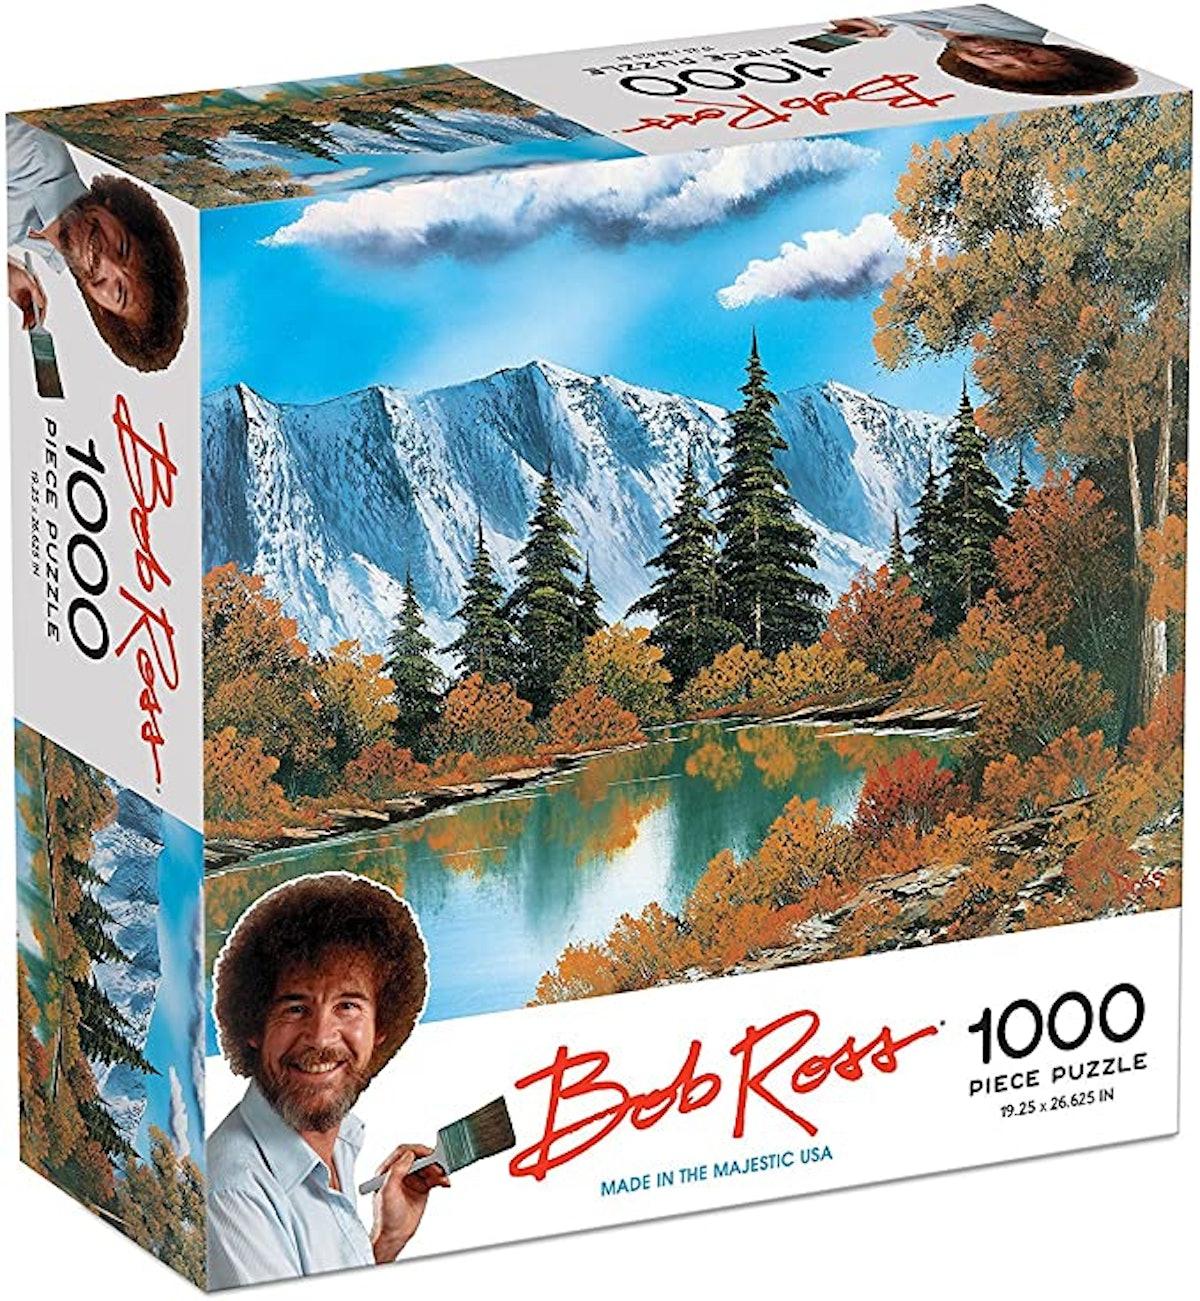 Bob Ross Autumn Woods - 1000 Piece Jigsaw Puzzle